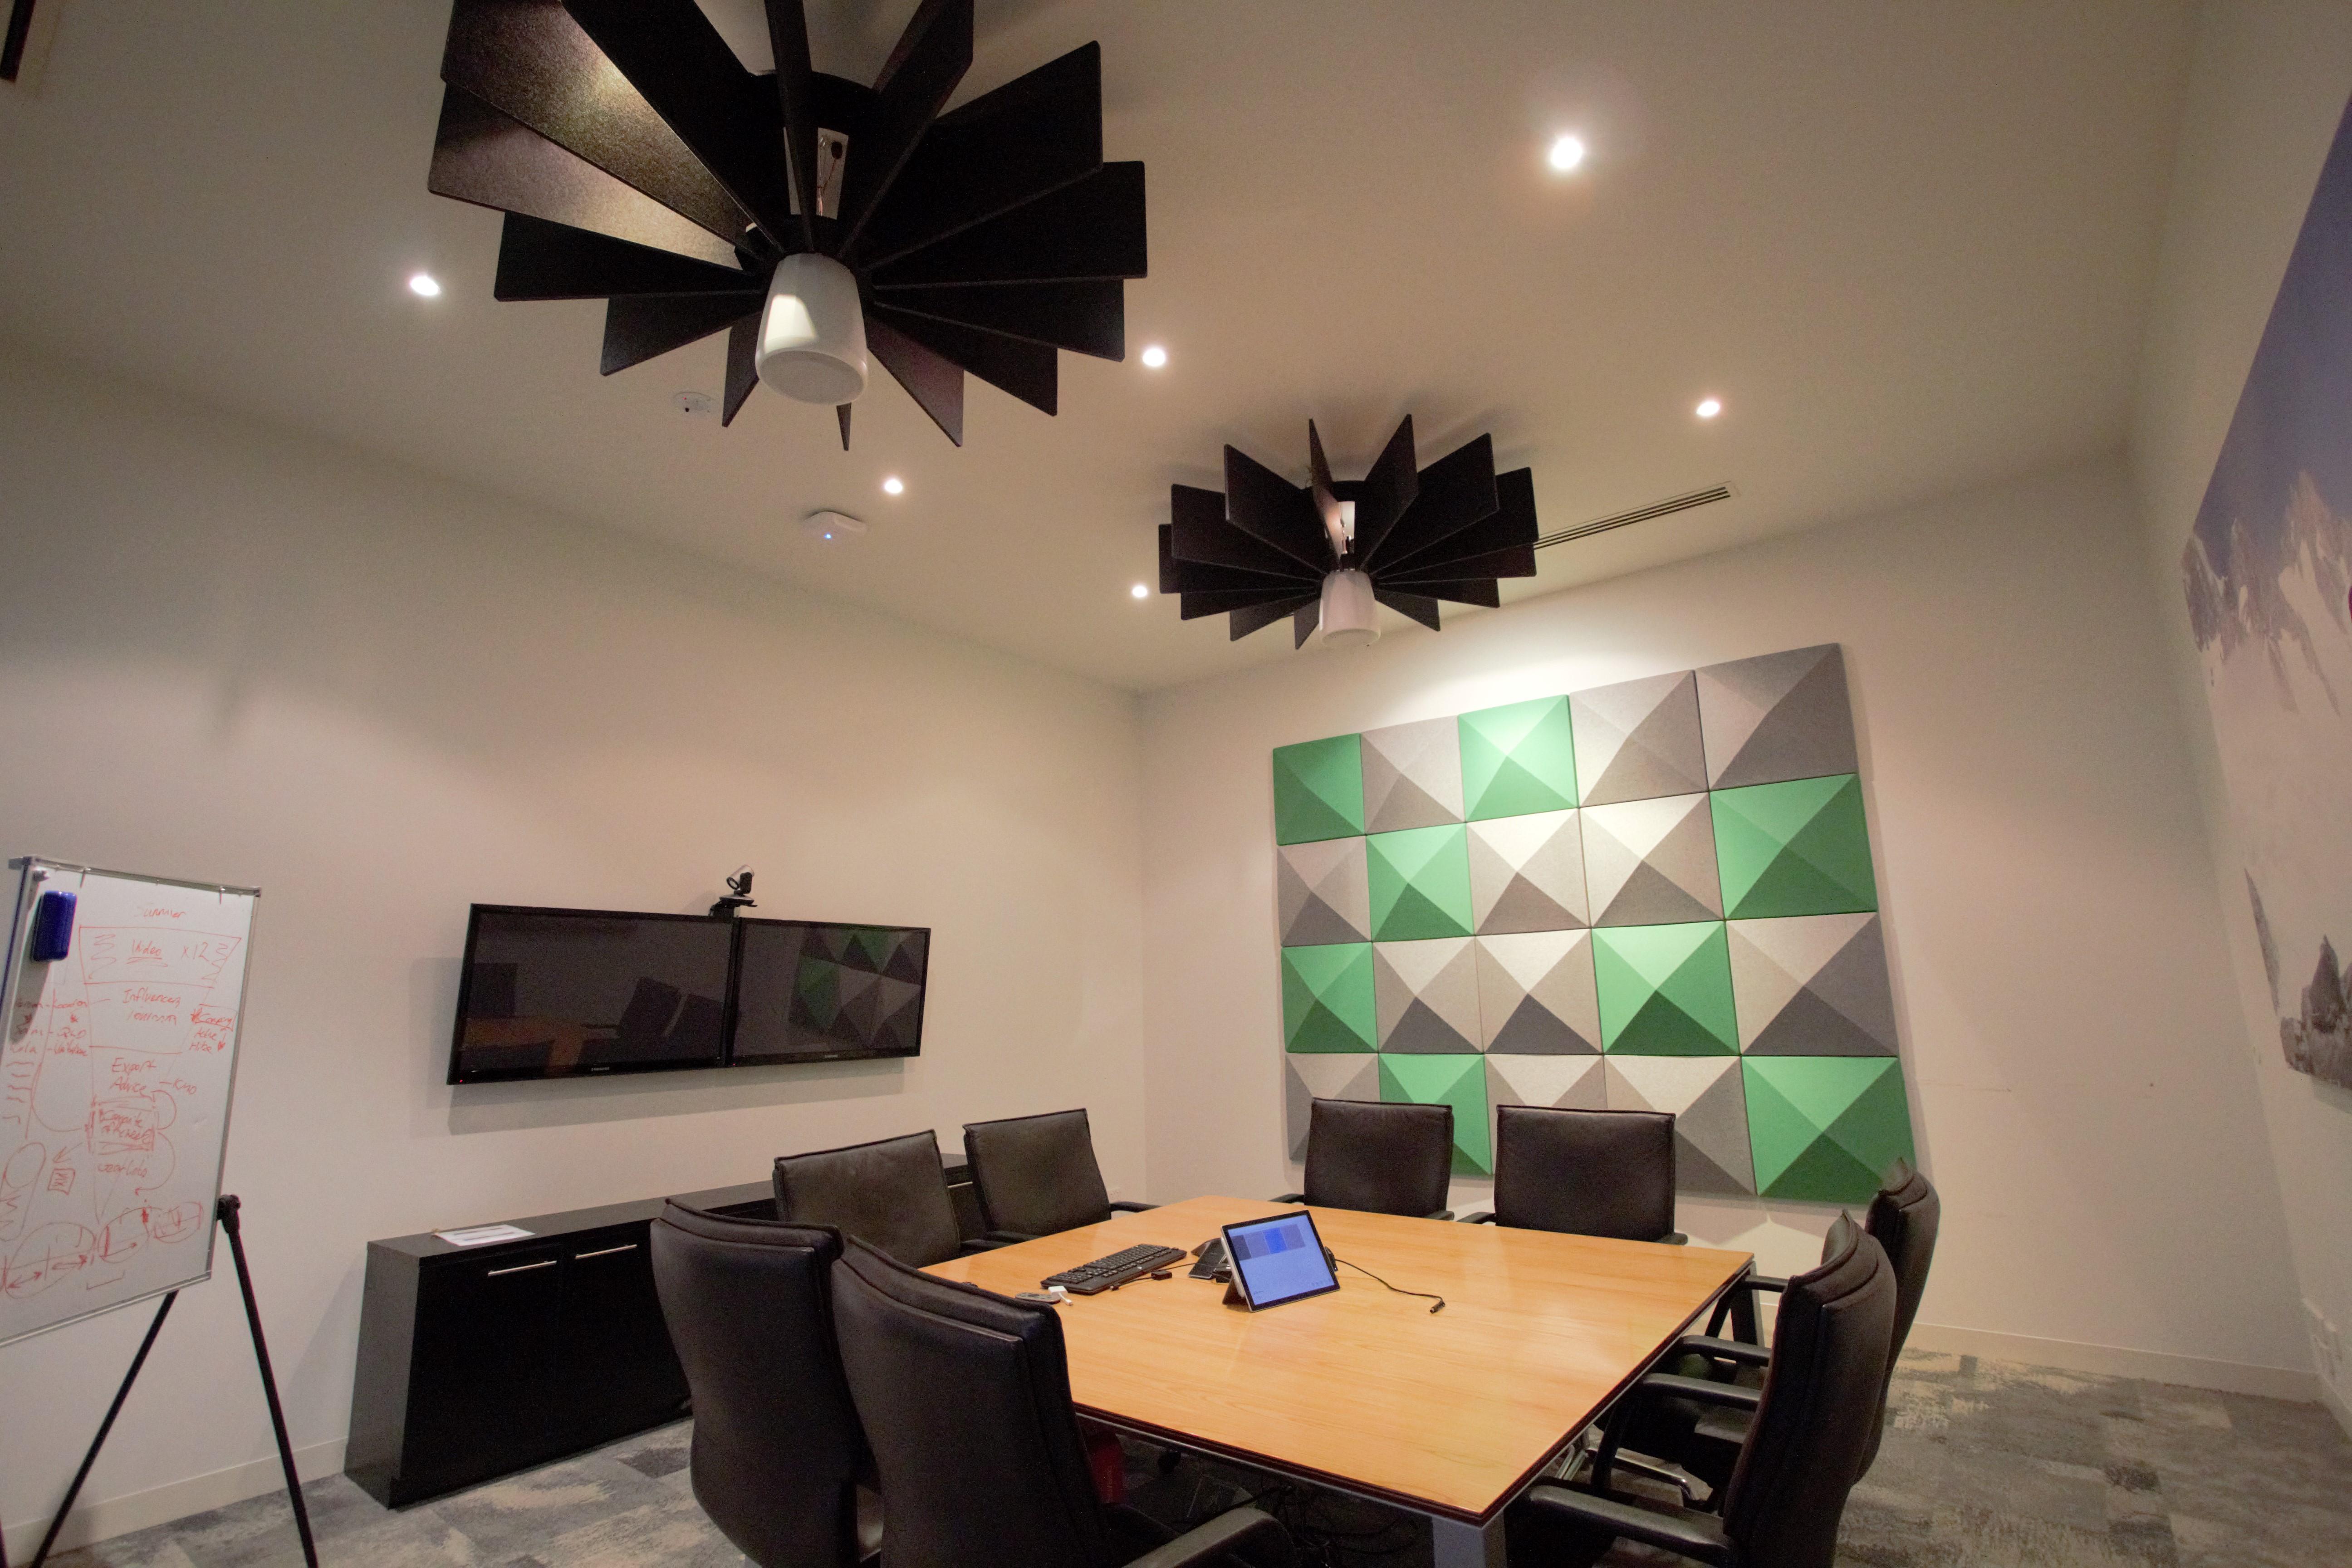 Kathmandu Office: Series 5 - 37 Acoustic 3D Wall Tiles and Torus Acoustic Ceiling Lattice